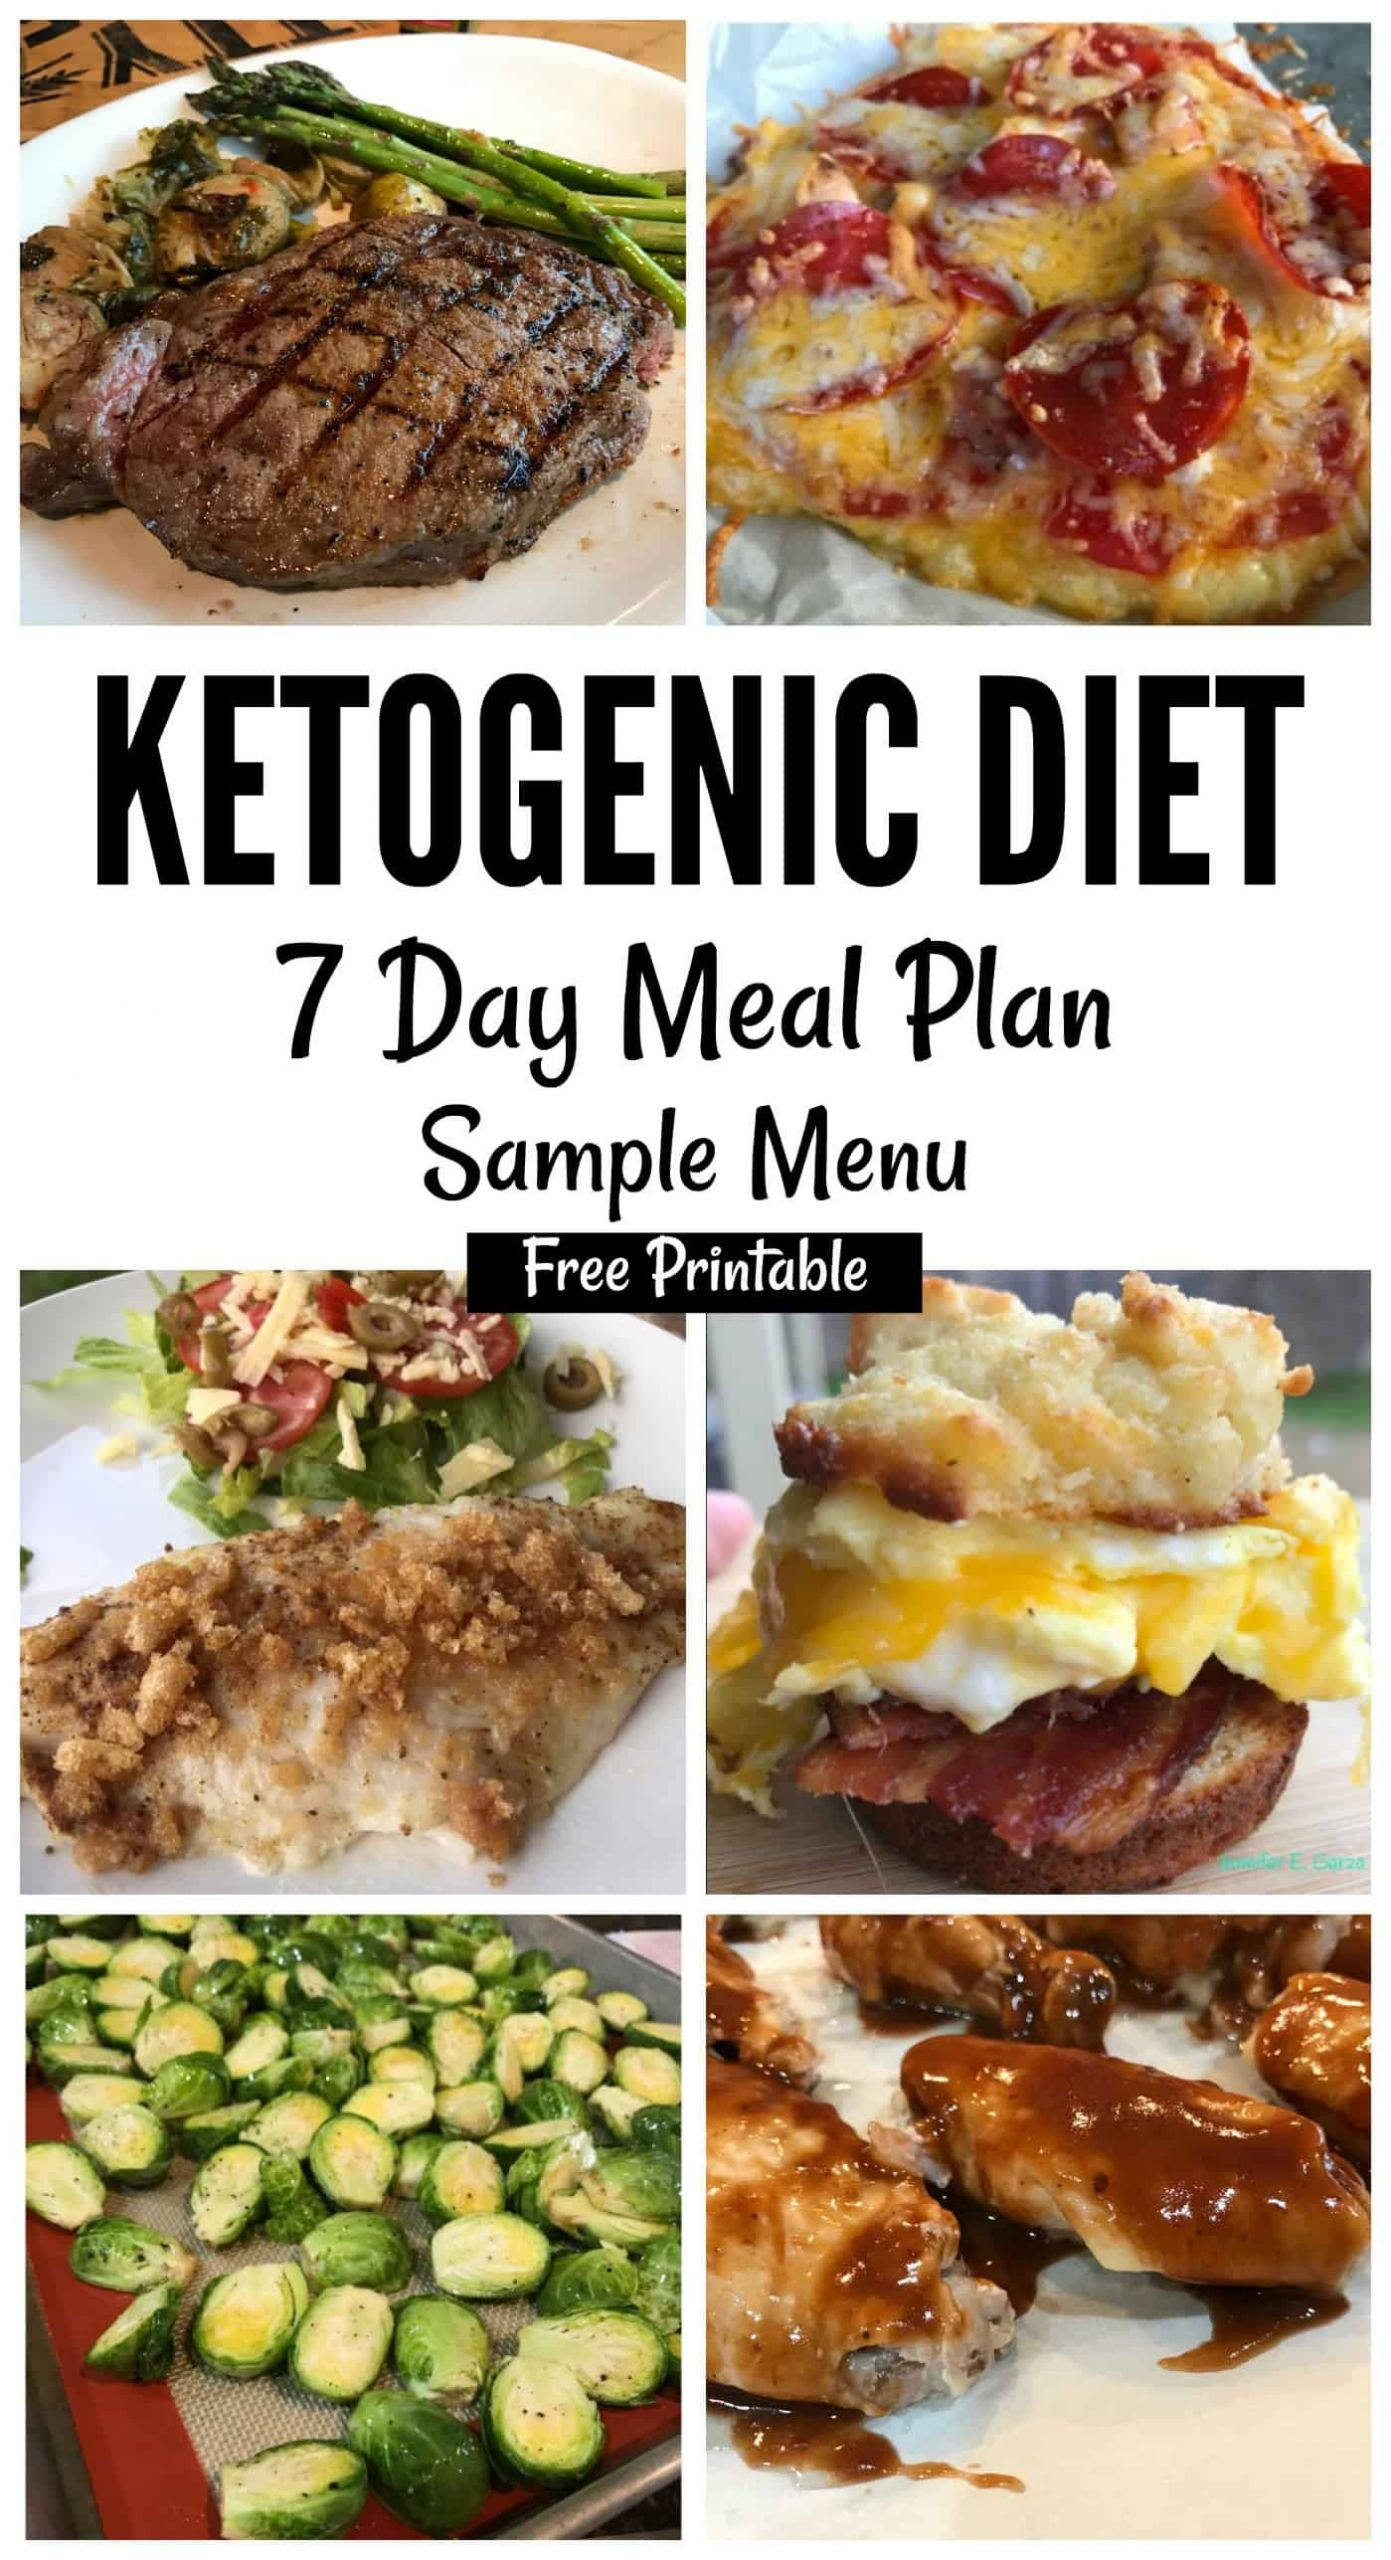 Menu For Keto Diet  Keto Sample Menu 7 Day Plan iSaveA2Z